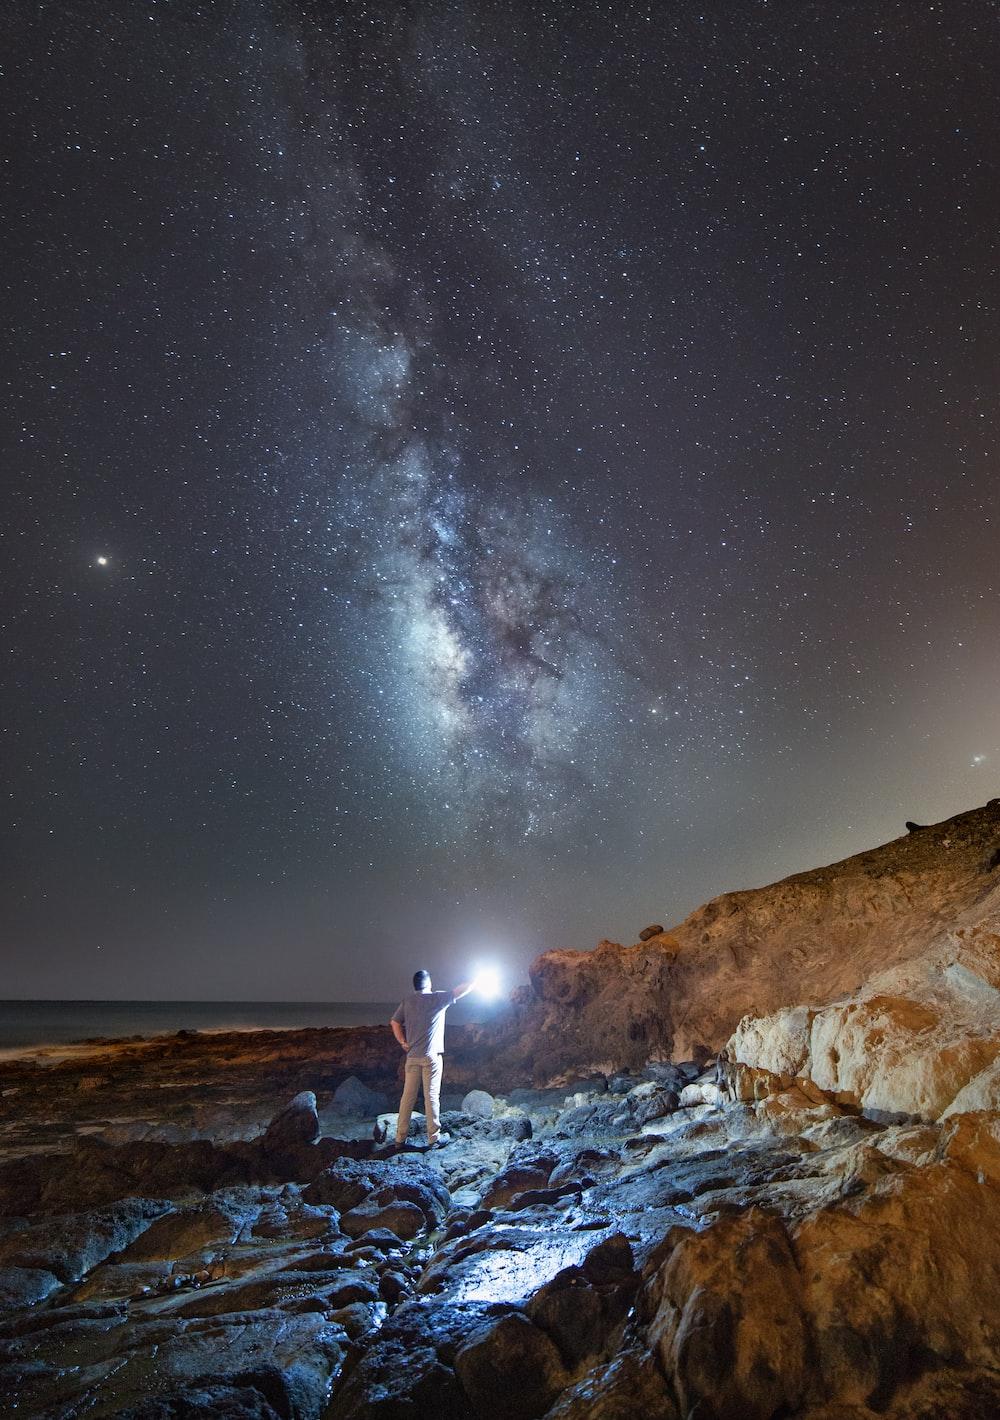 man holding light under night sky